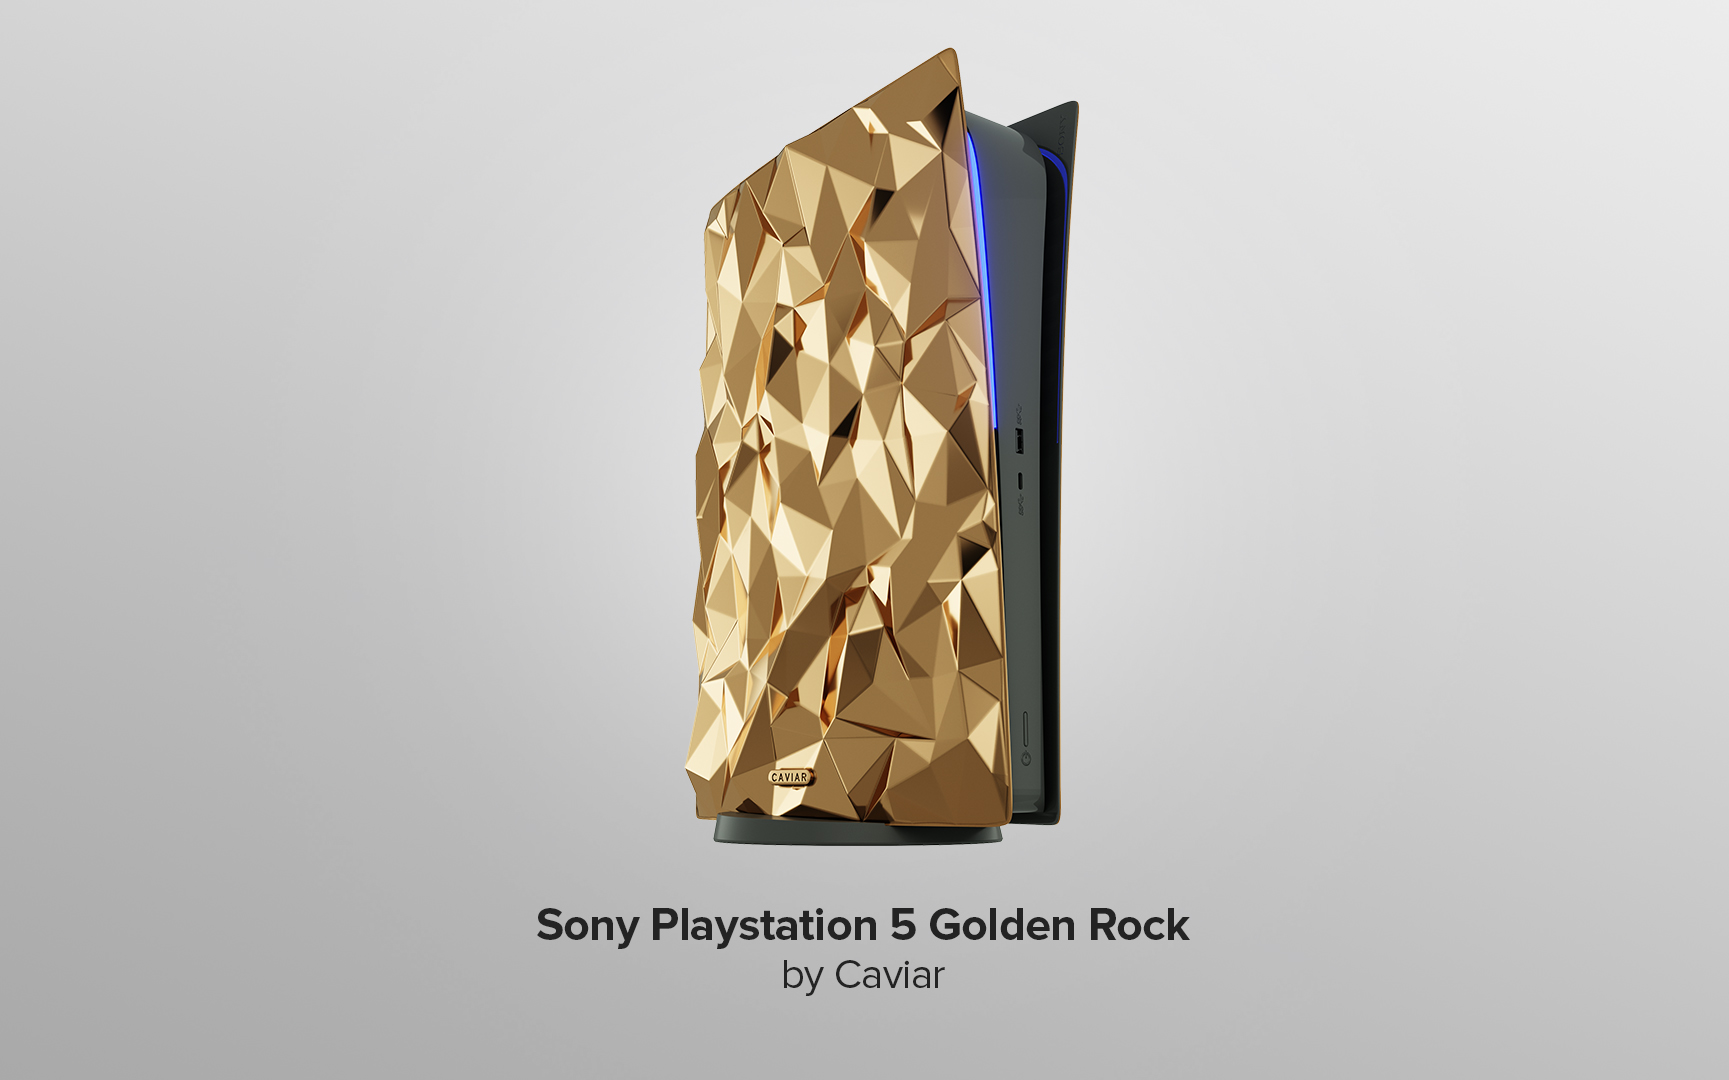 PlayStation 5 Golden Rock